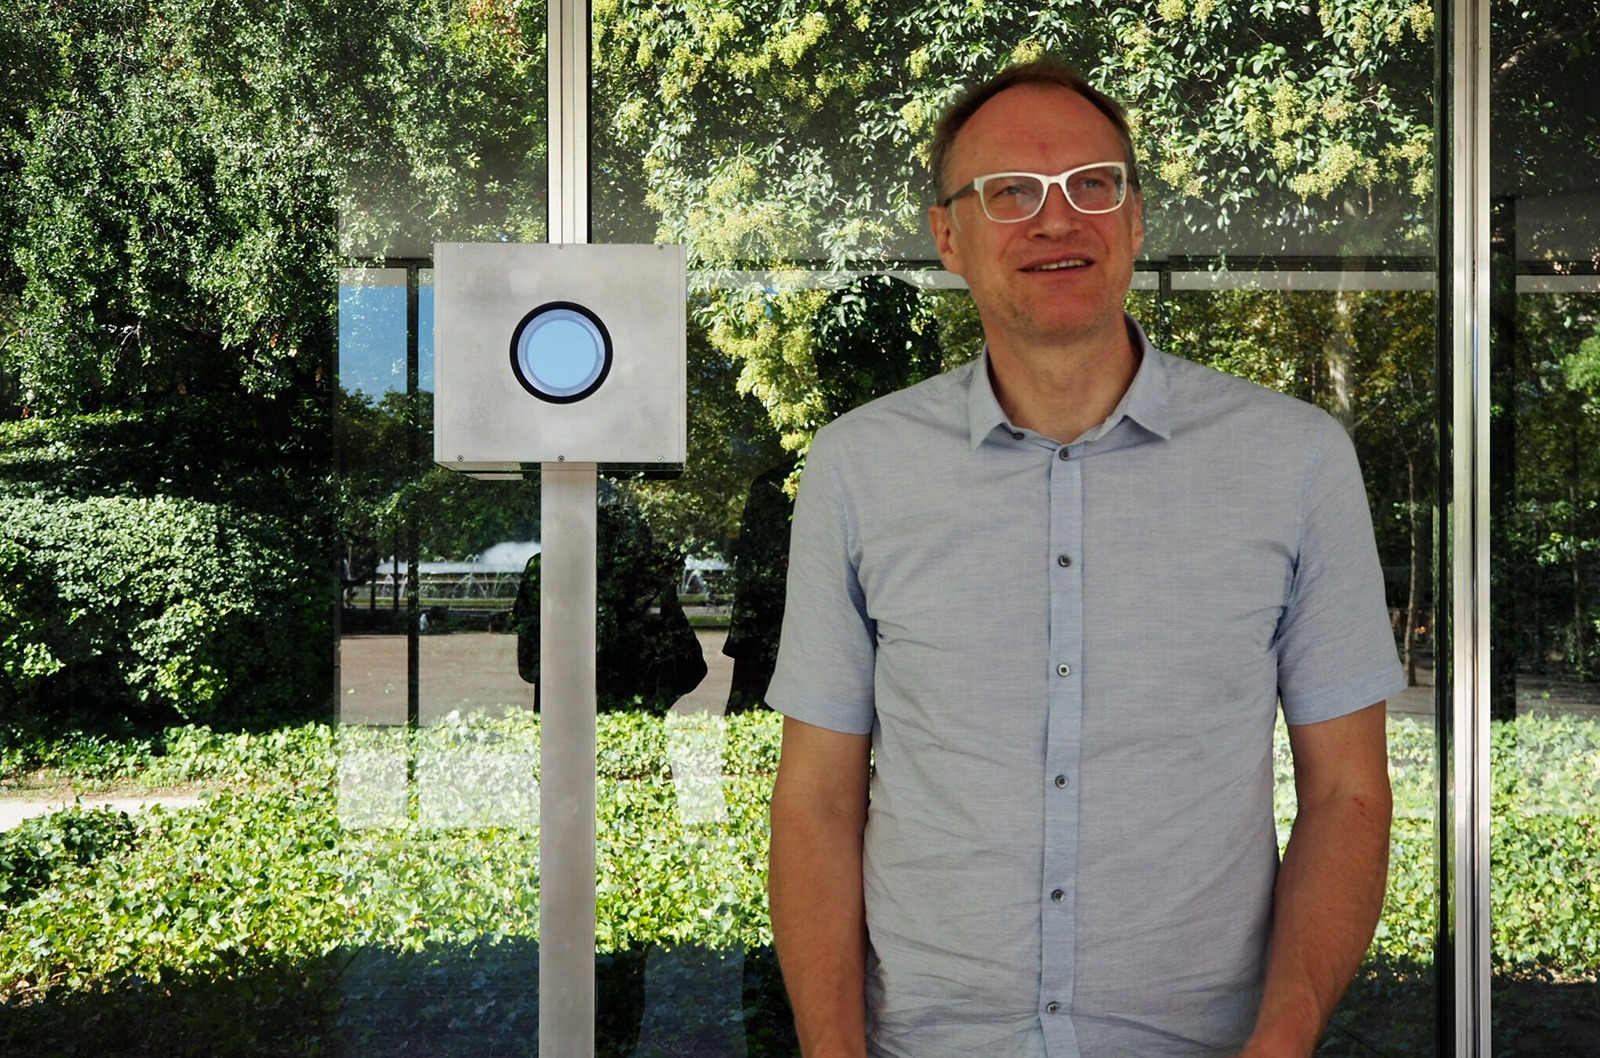 Michael Wesely standing next to his long exposure camera at Mies van der Rohe's Barcelona Pavilion. Copyright: Marta Pérez – Labóh.